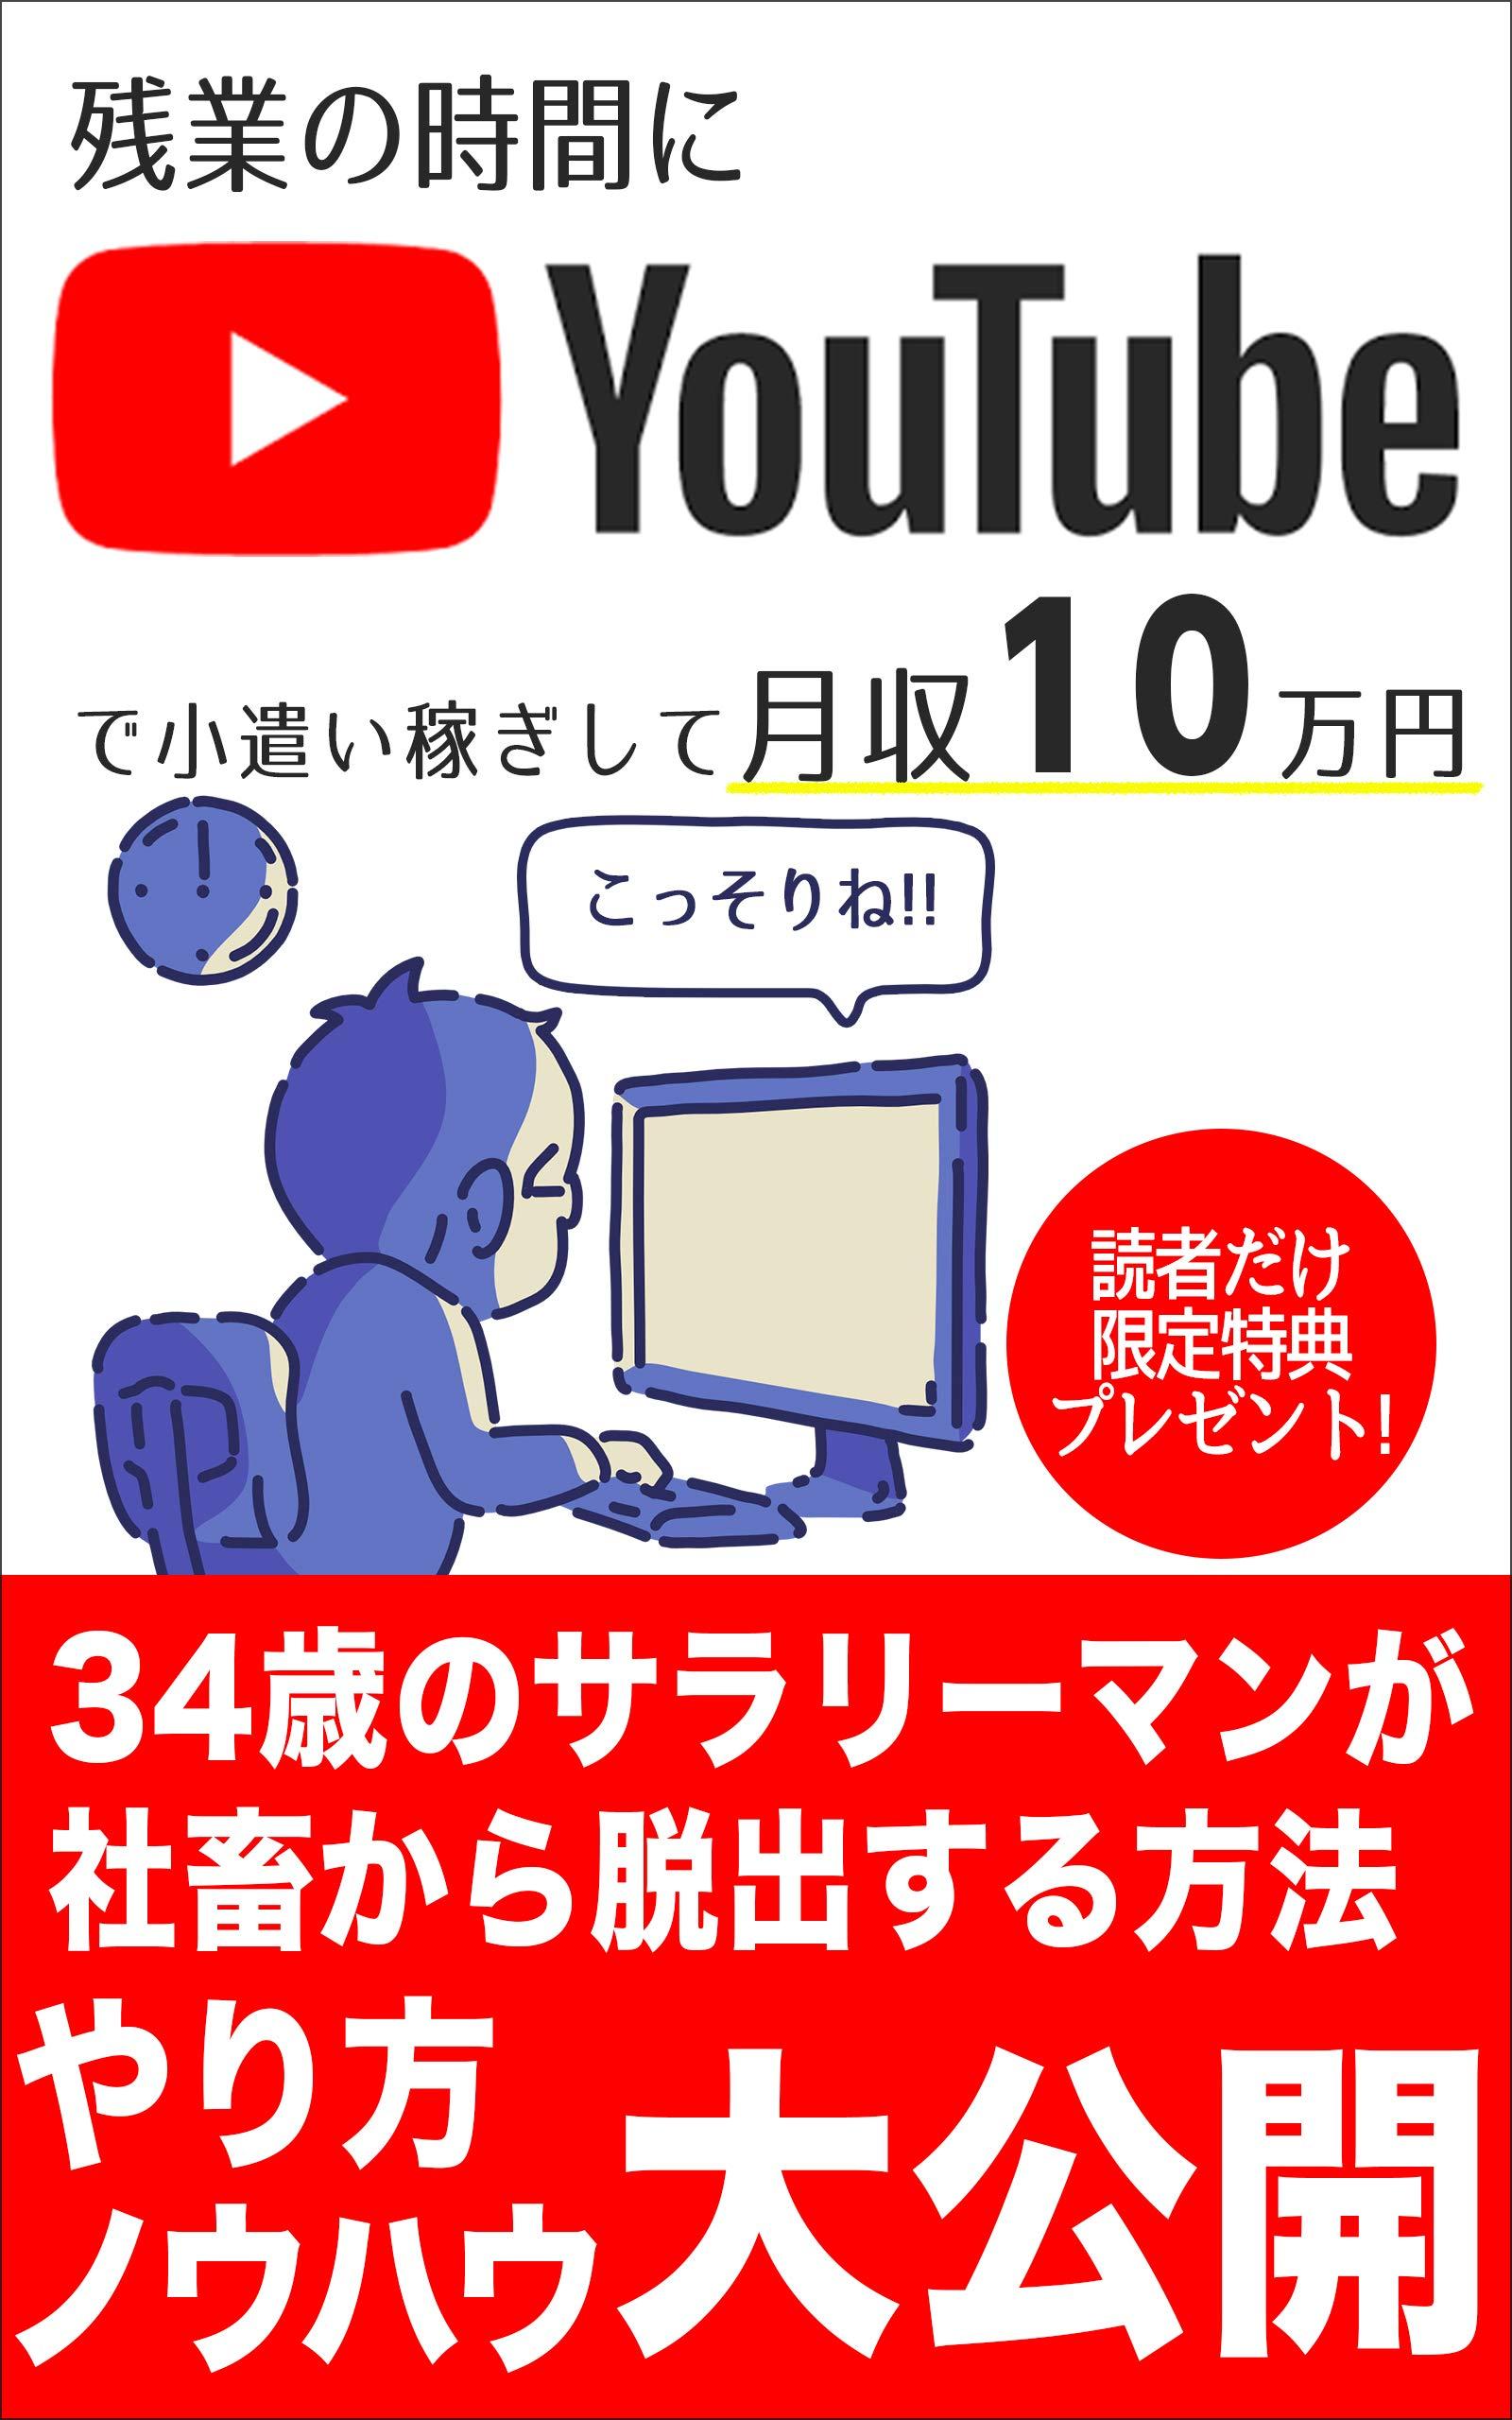 sanjyuyonsainosararimangasyatikukaradasyutusuruyoutubedekodukaikasegisitegesyuujyuumannennsyuukyakusararimanhukugyou: zangyoujikannikodukaikasegishitegesyuujyuumanen (Japanese Edition)